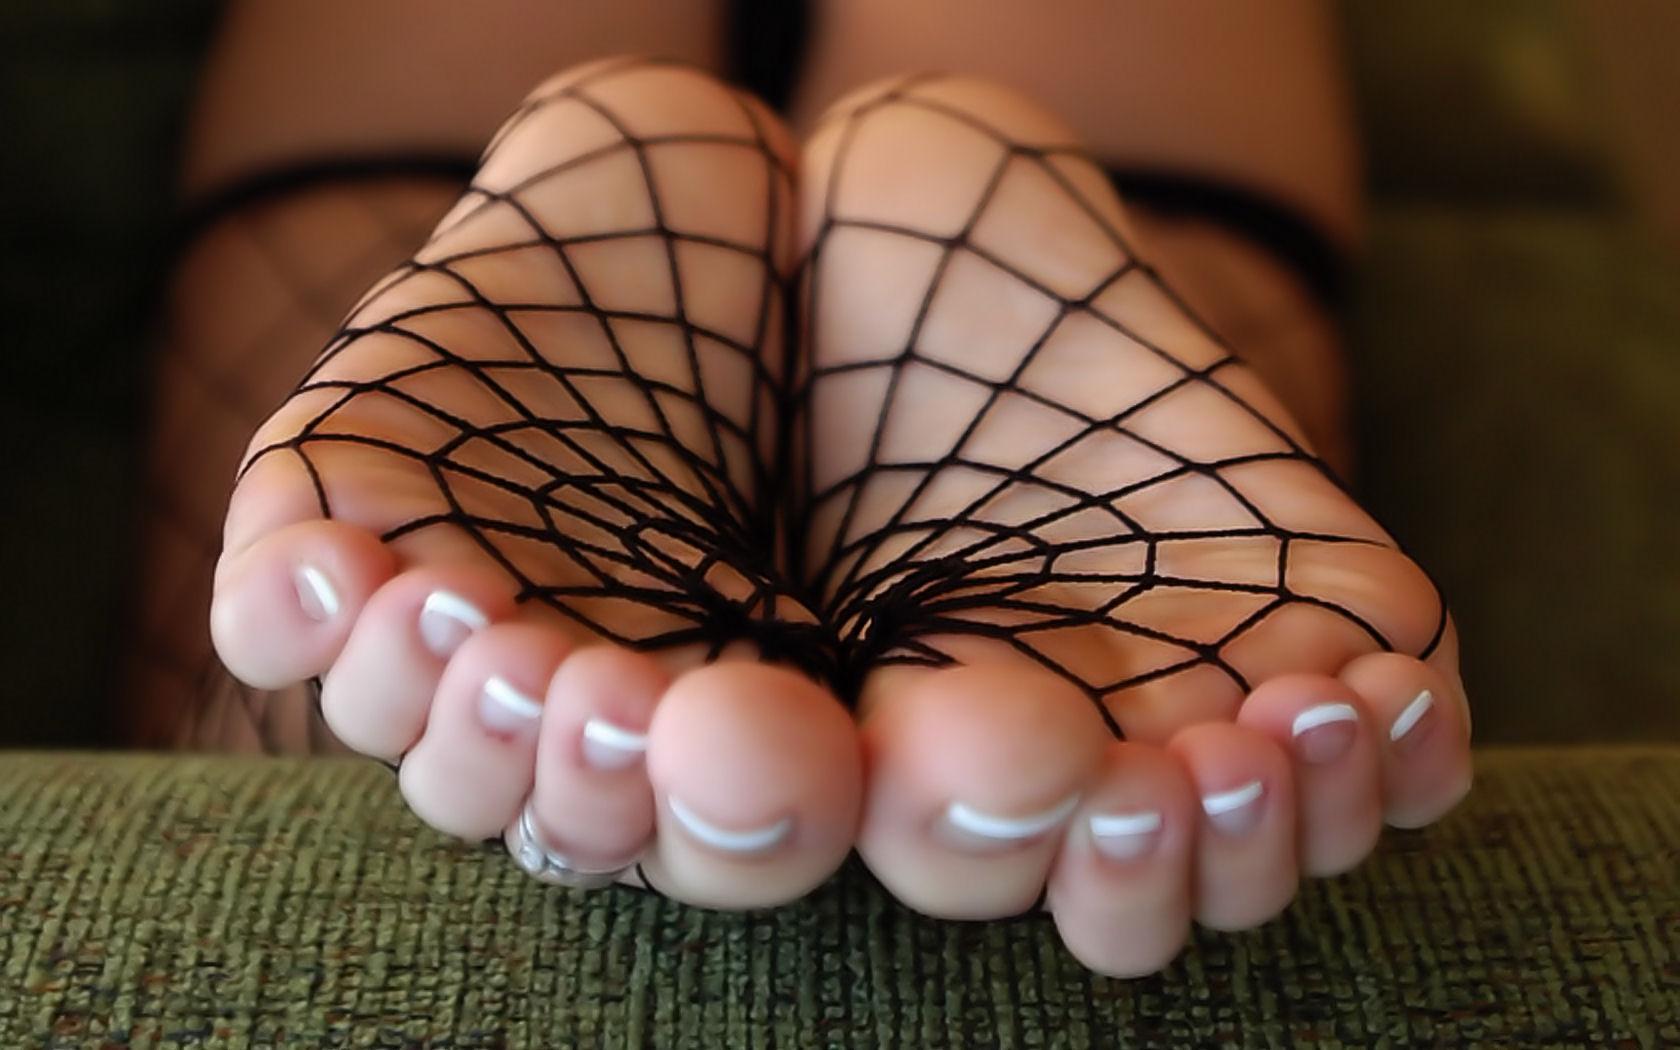 Фут фетиш ножками в hd 720 5 фотография